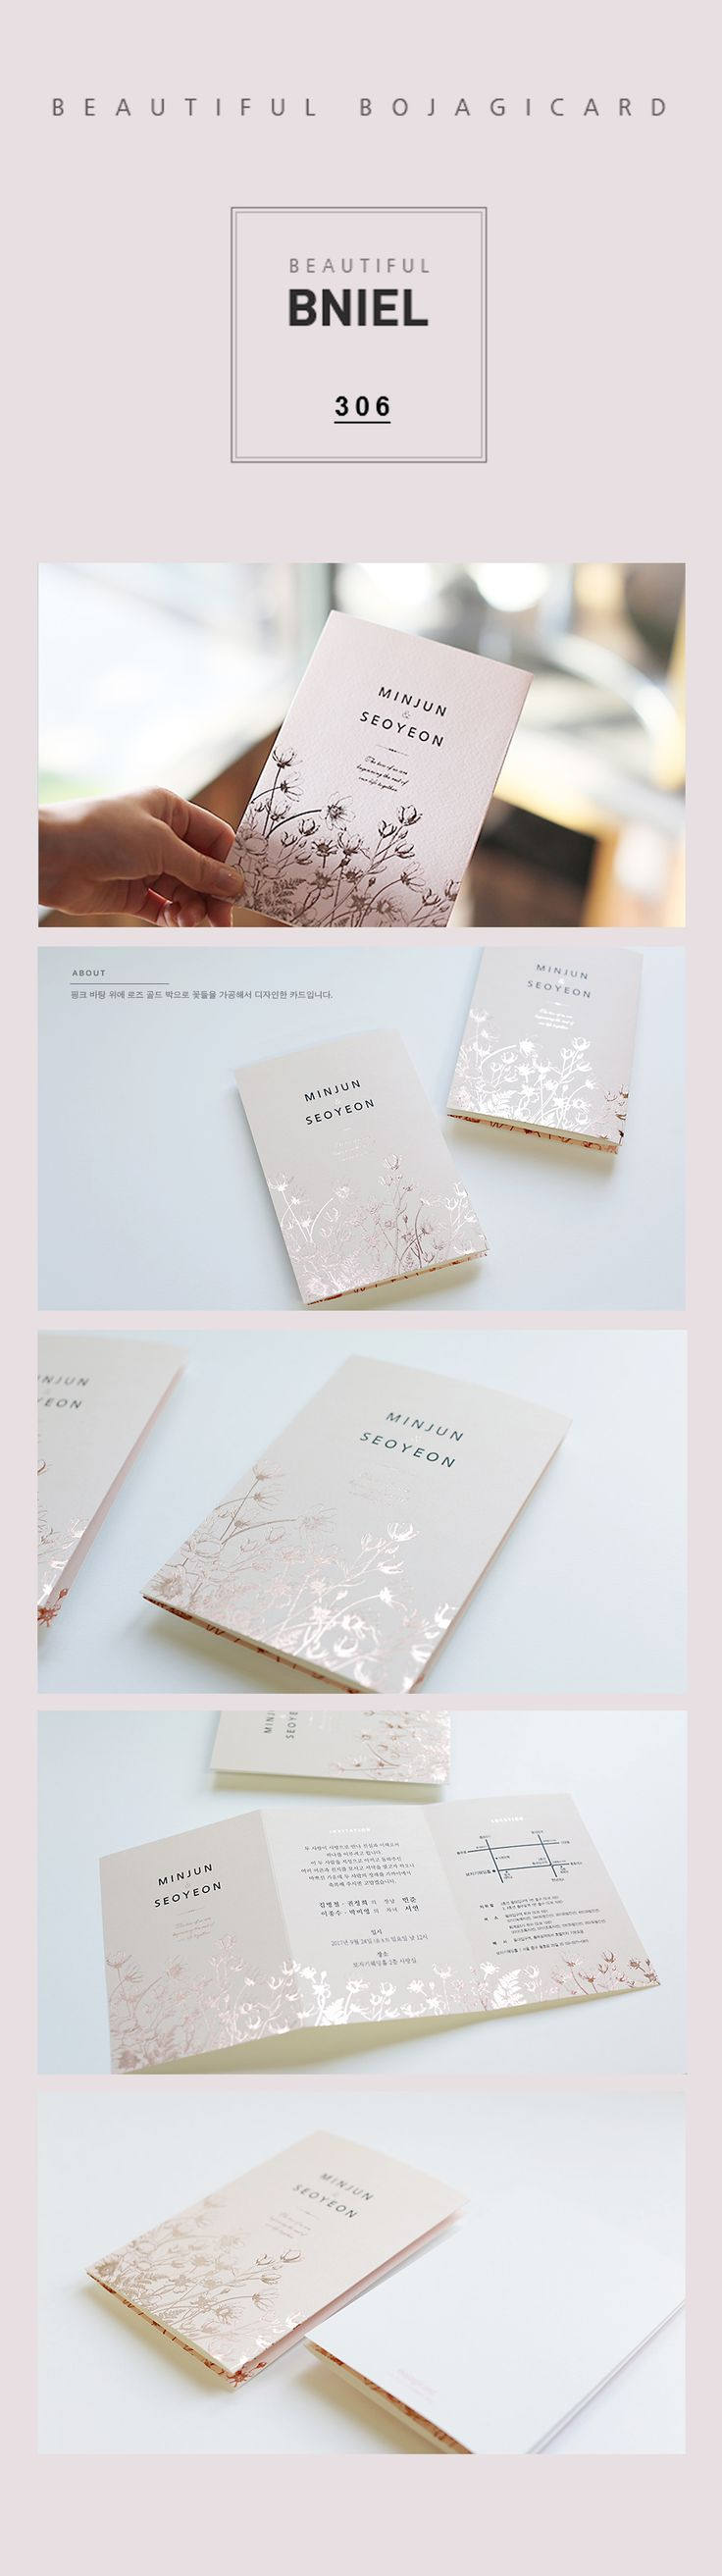 11 Best Wedding Invites Images On Pinterest Wedding Invitation